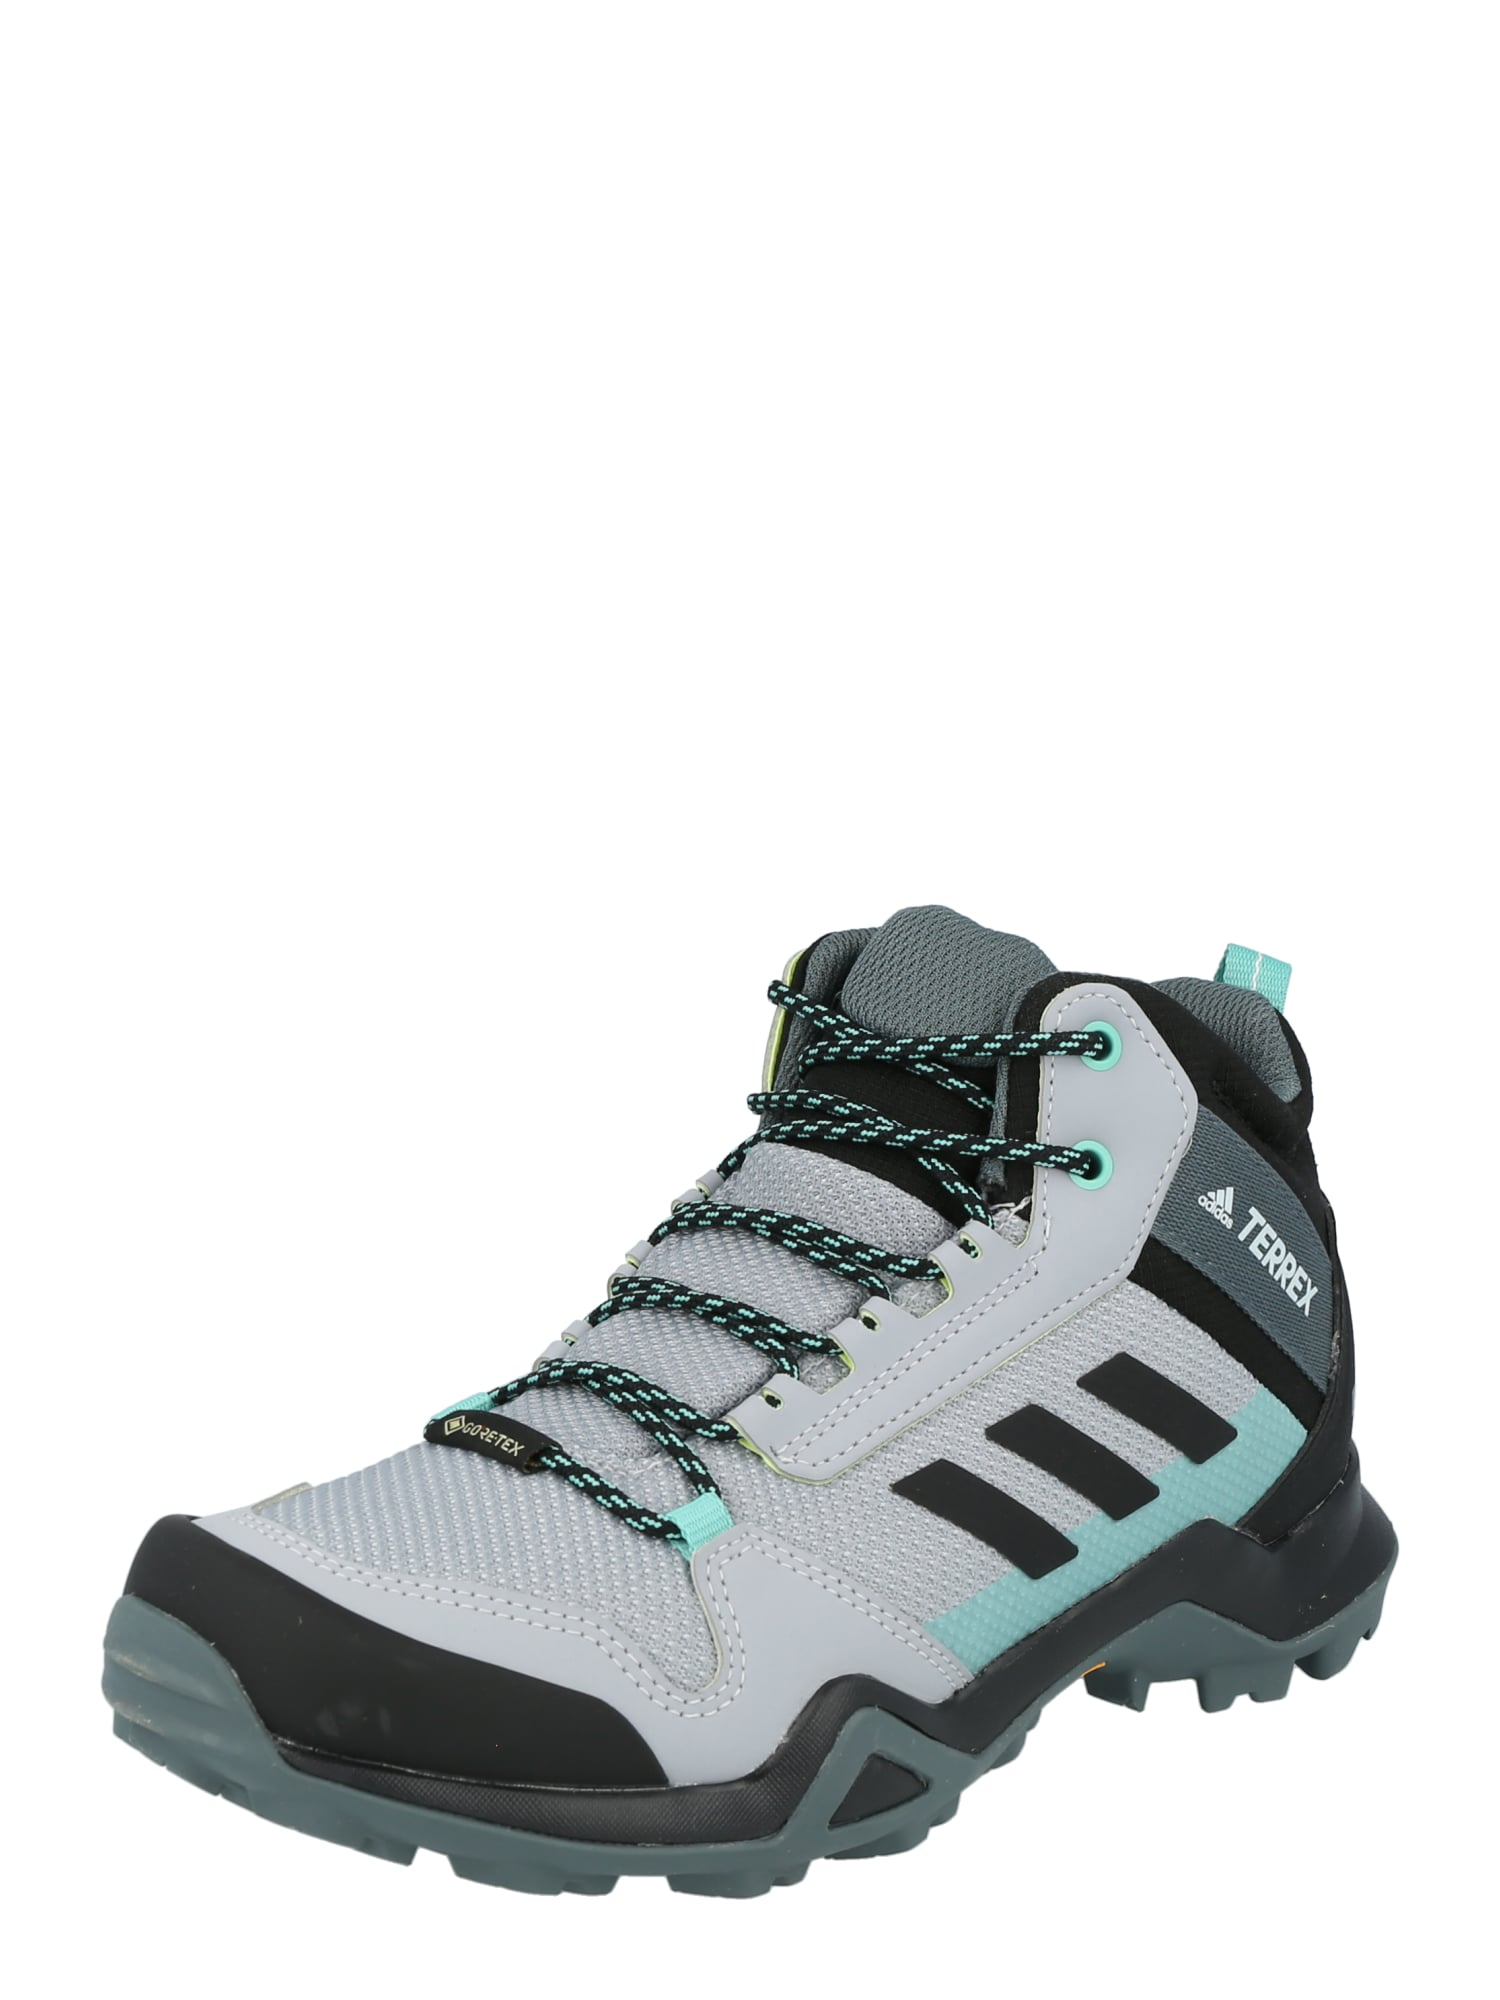 ADIDAS PERFORMANCE Sportiniai batai 'TERREX AX3 MID GTX' pilka / bazalto pilka / mėtų spalva / balta